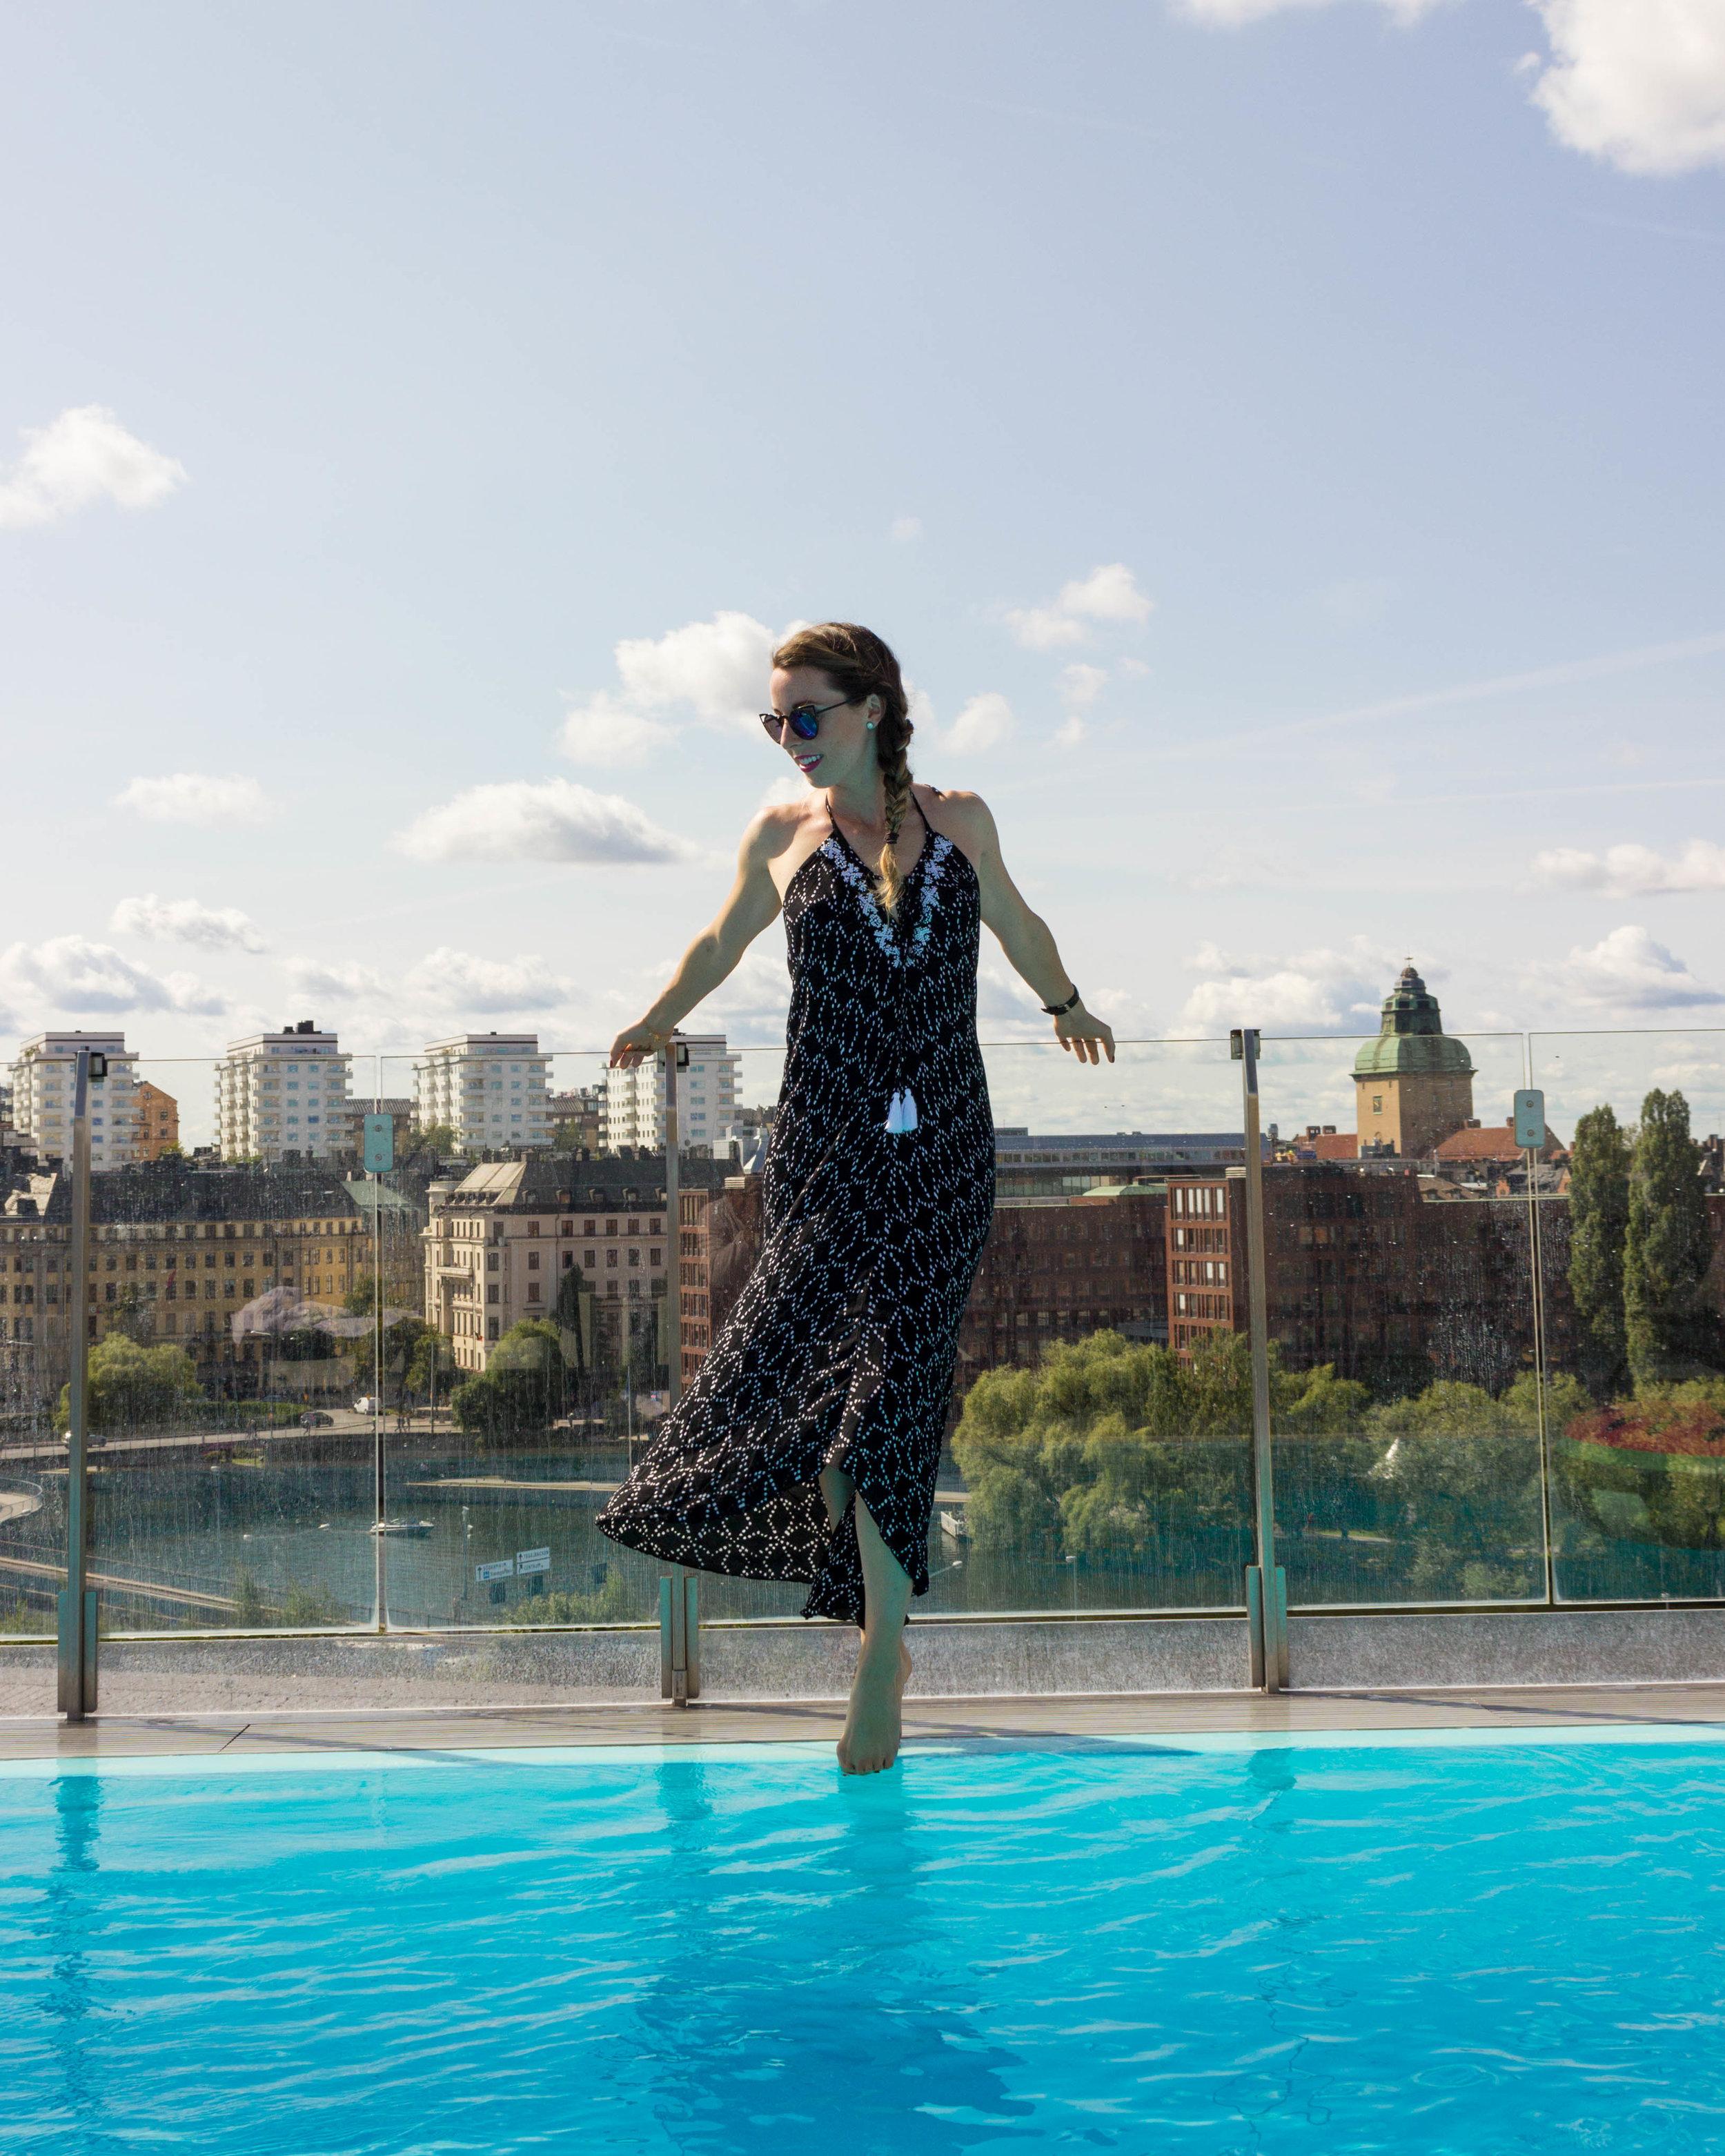 Enjoying the beautiful pool at Selma City Spa in my  Amita Naithani  Embroidered Moroccan Tile Print Halter Dress